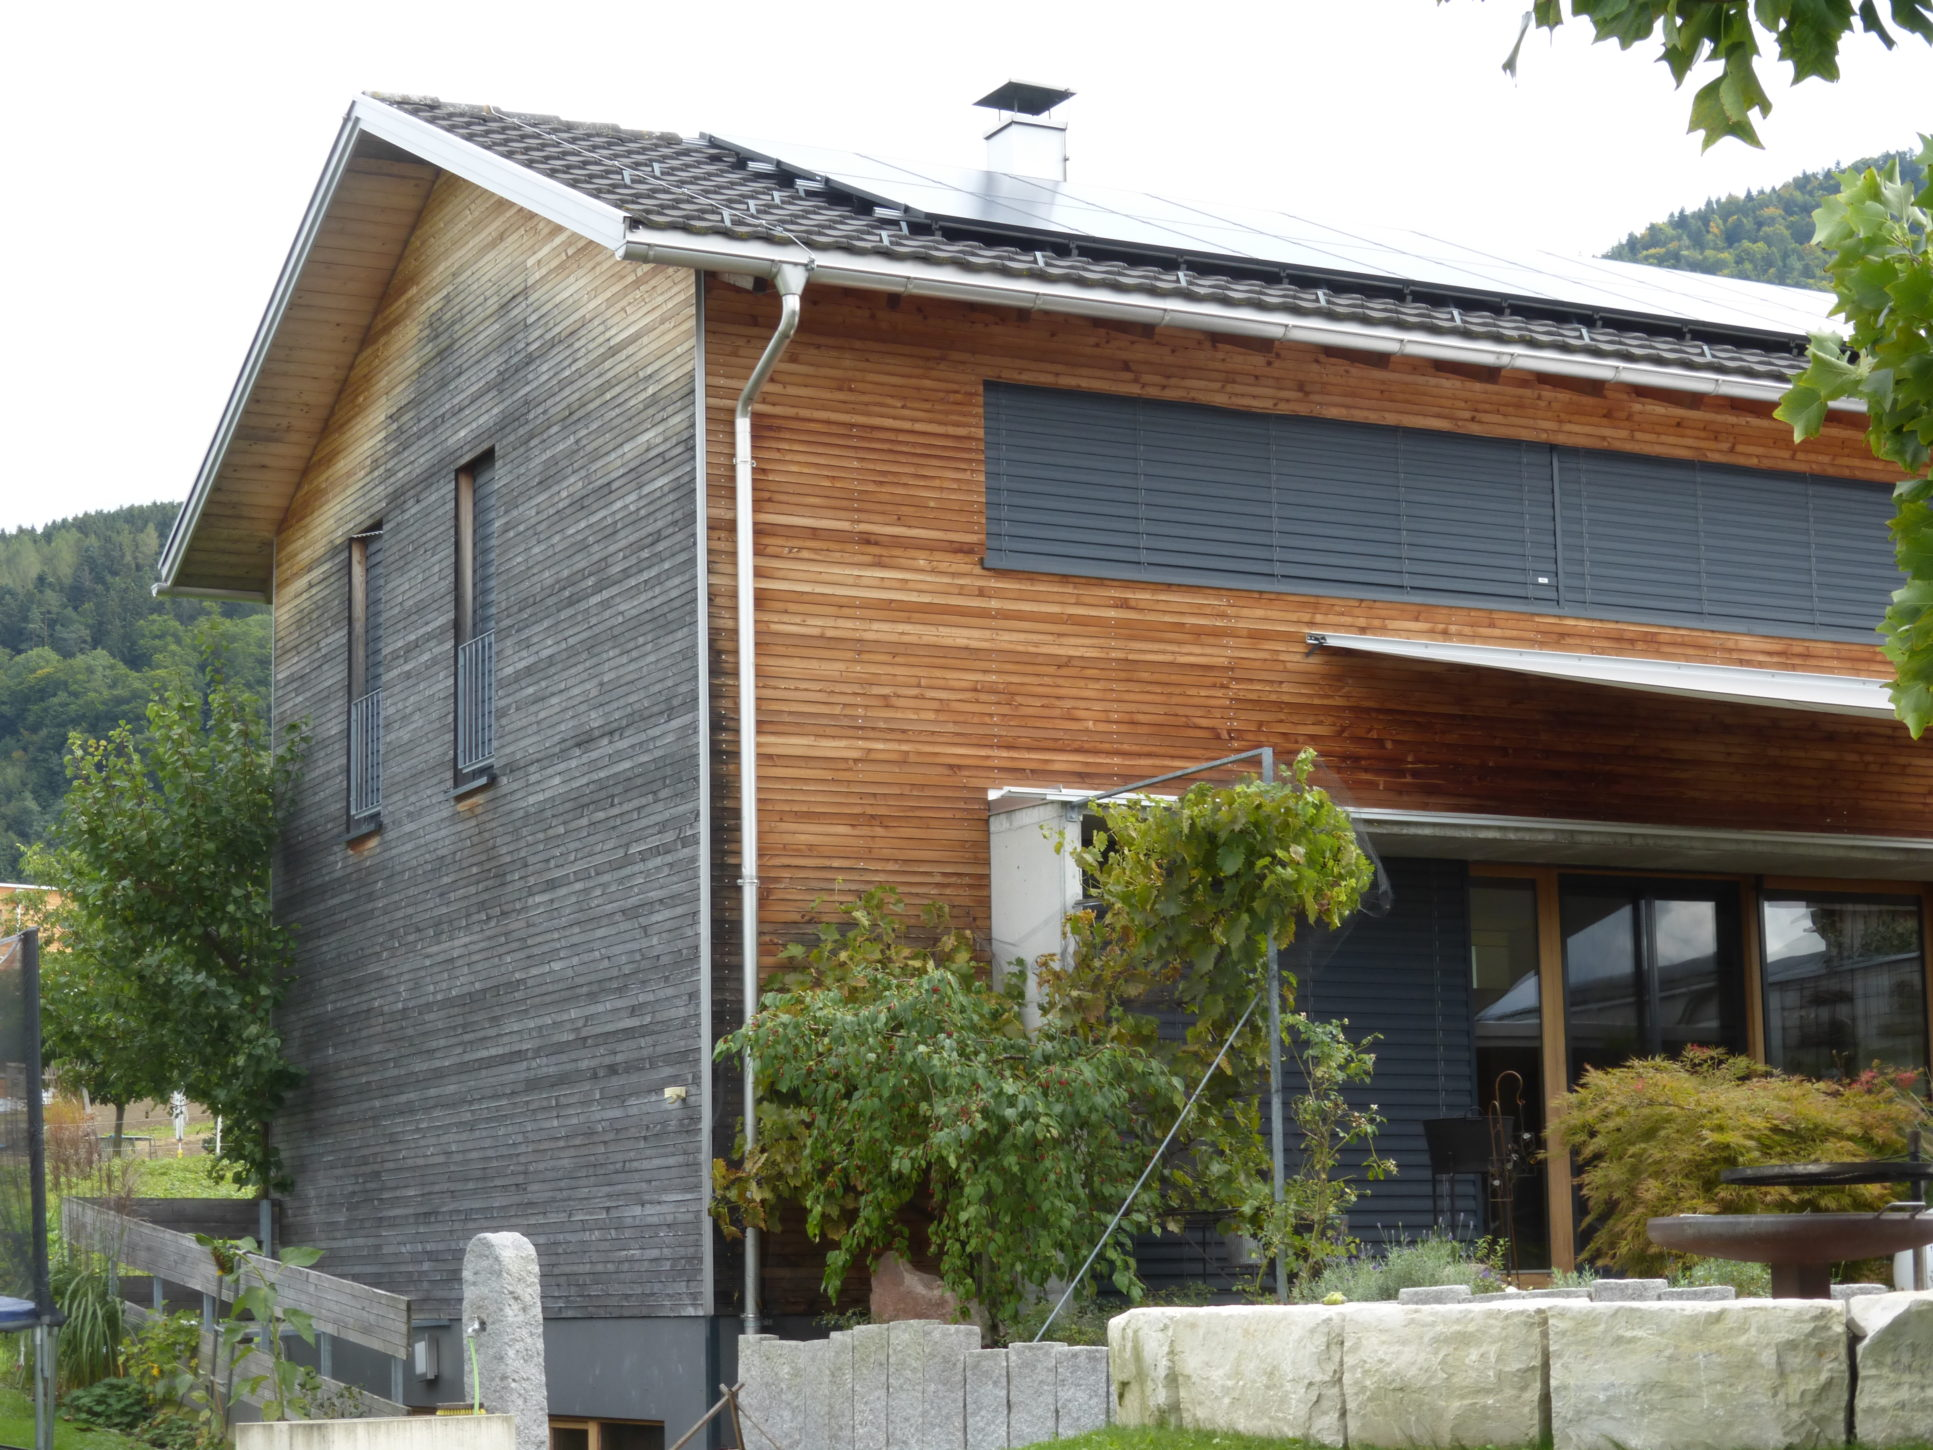 energie bonus bayern f r energieeffiziente neubauten. Black Bedroom Furniture Sets. Home Design Ideas